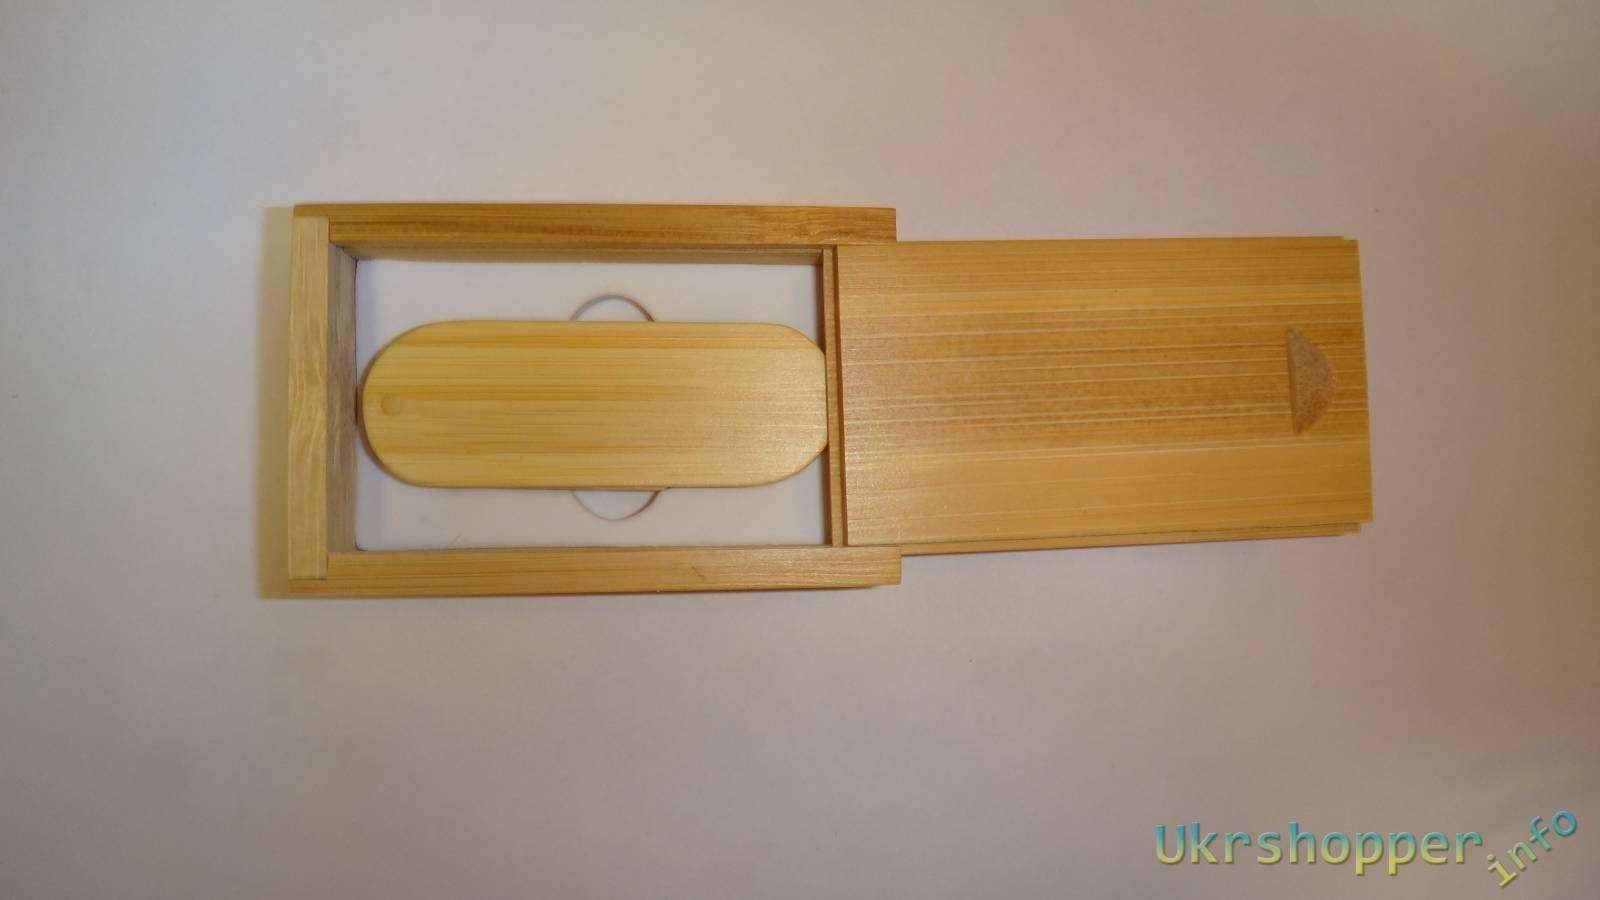 Aliexpress: Бамбуковая флешка в бамбуковой коробке на праздник к нам идут